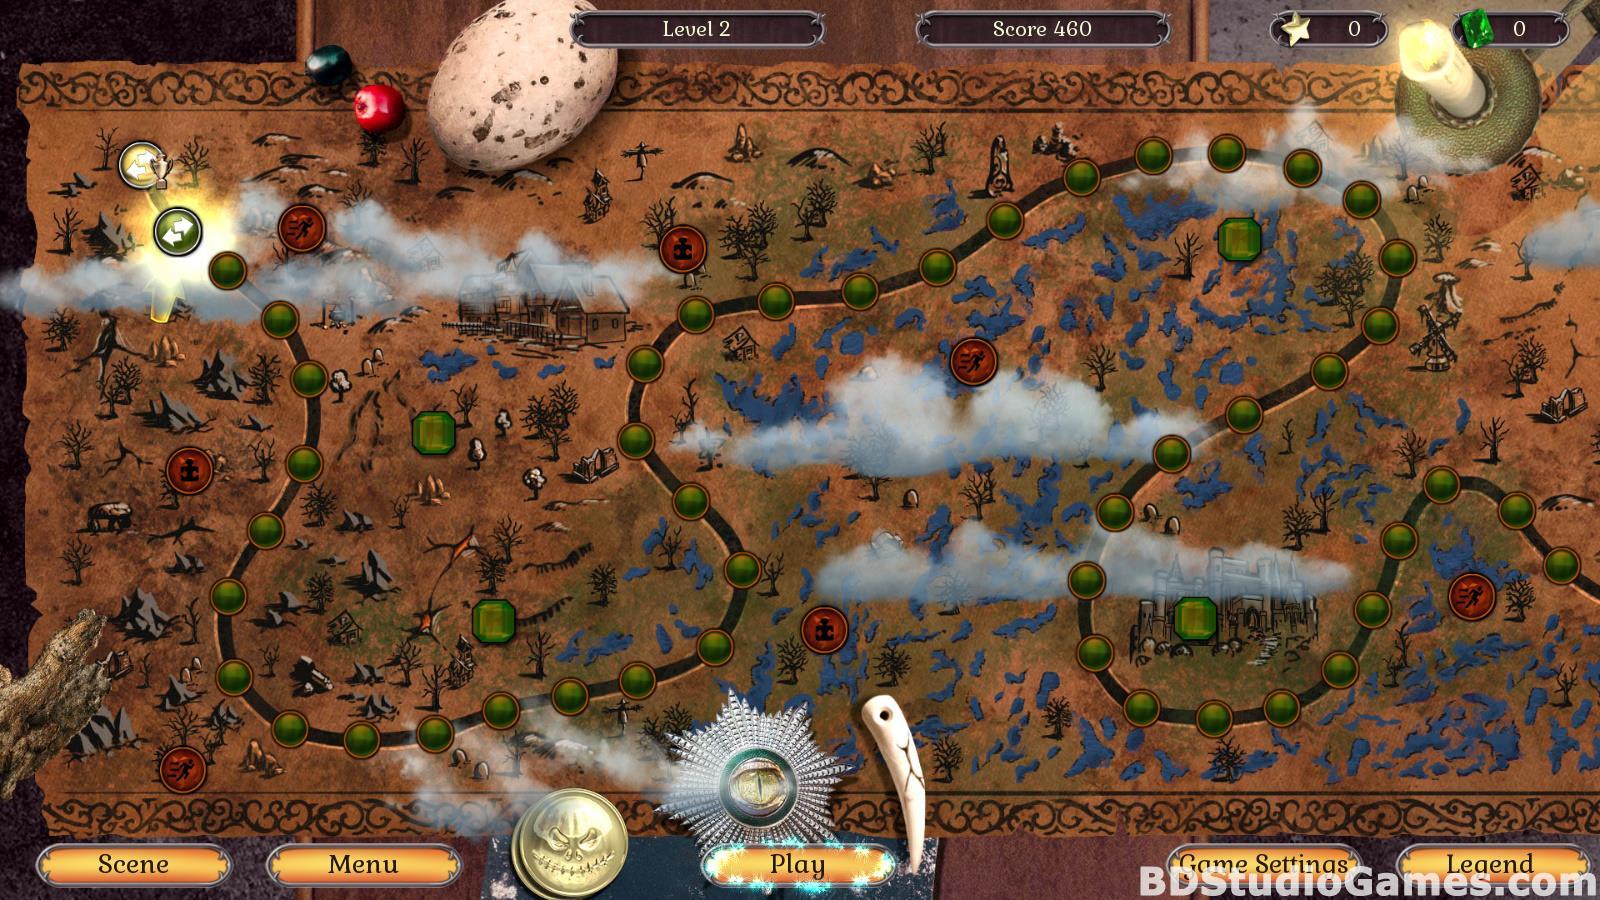 Jewel Match Twilight 3 Collector's Edition Screenshots 03